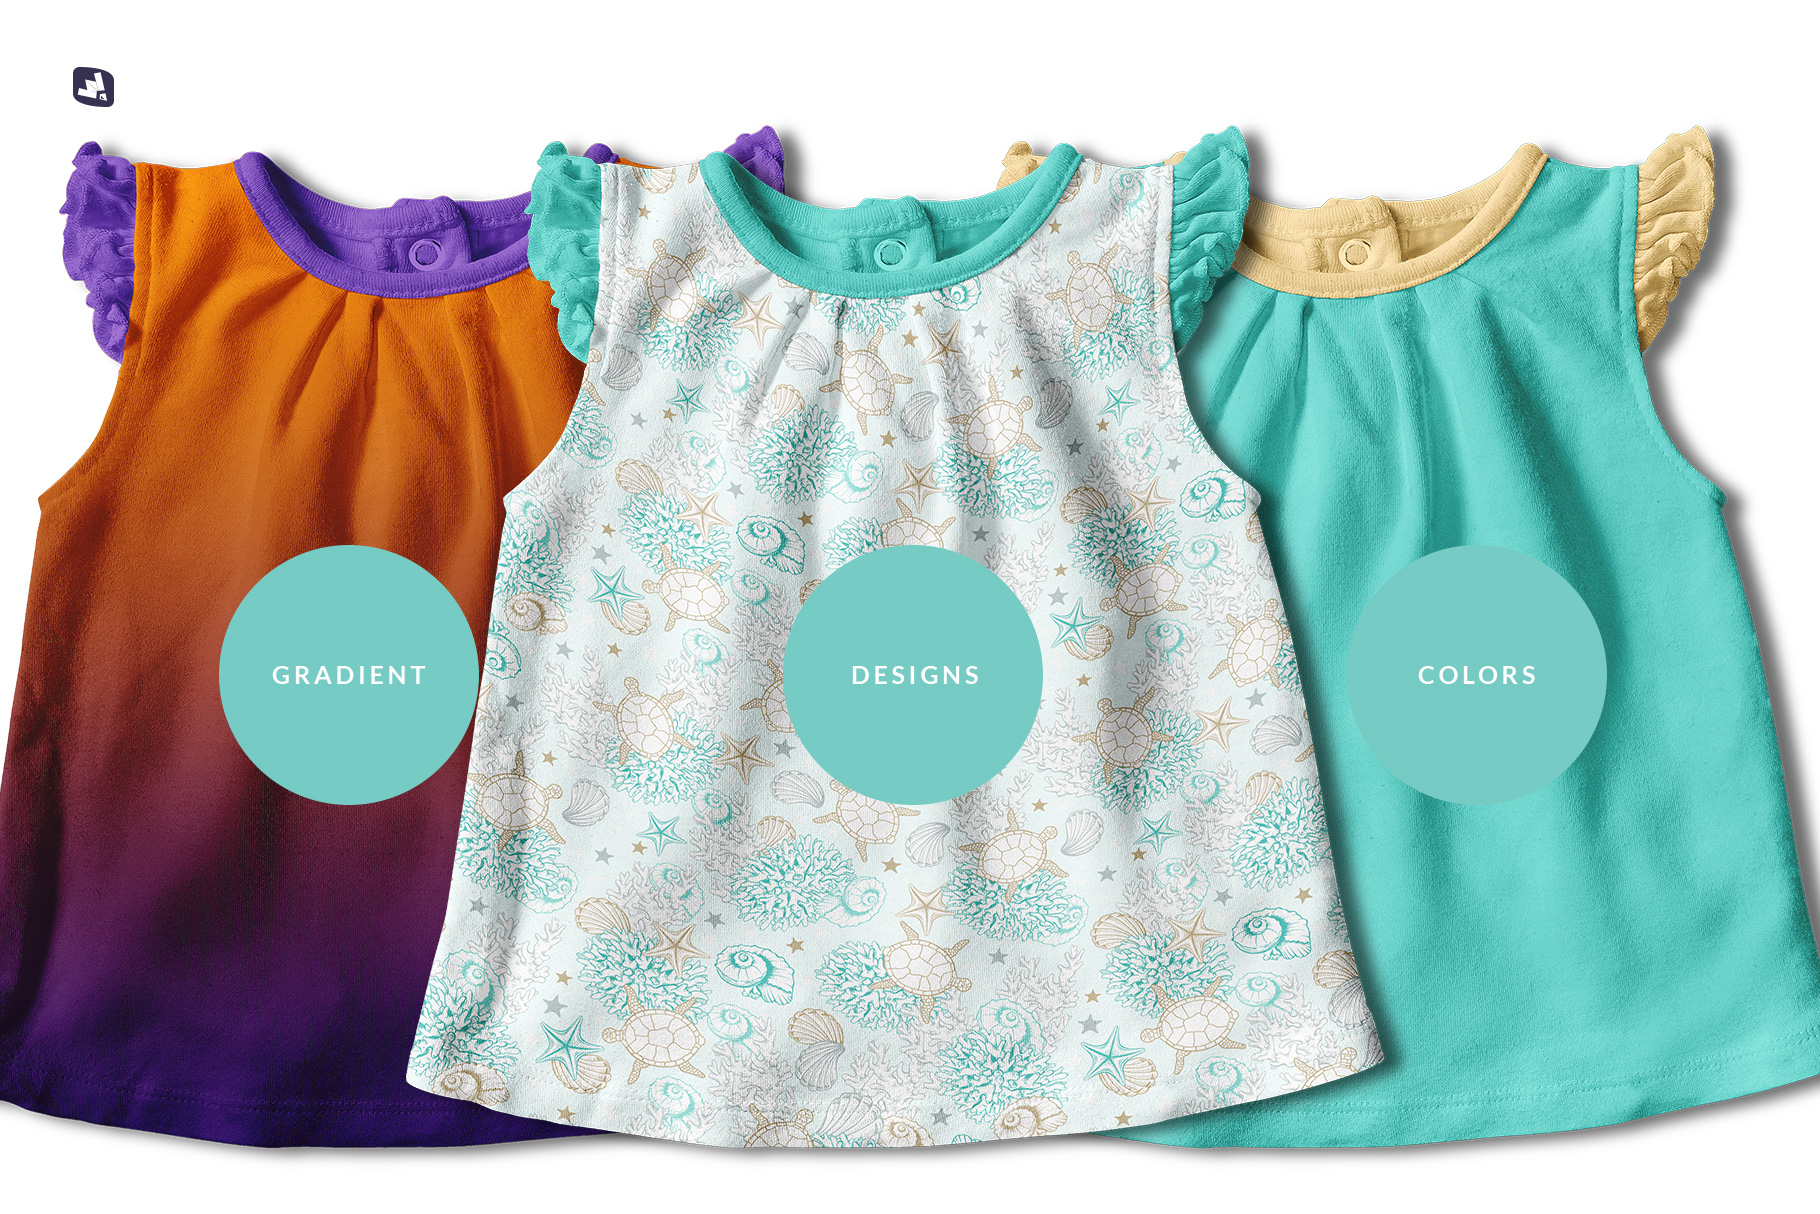 types of the ruffle sleeve baby girl top mockup